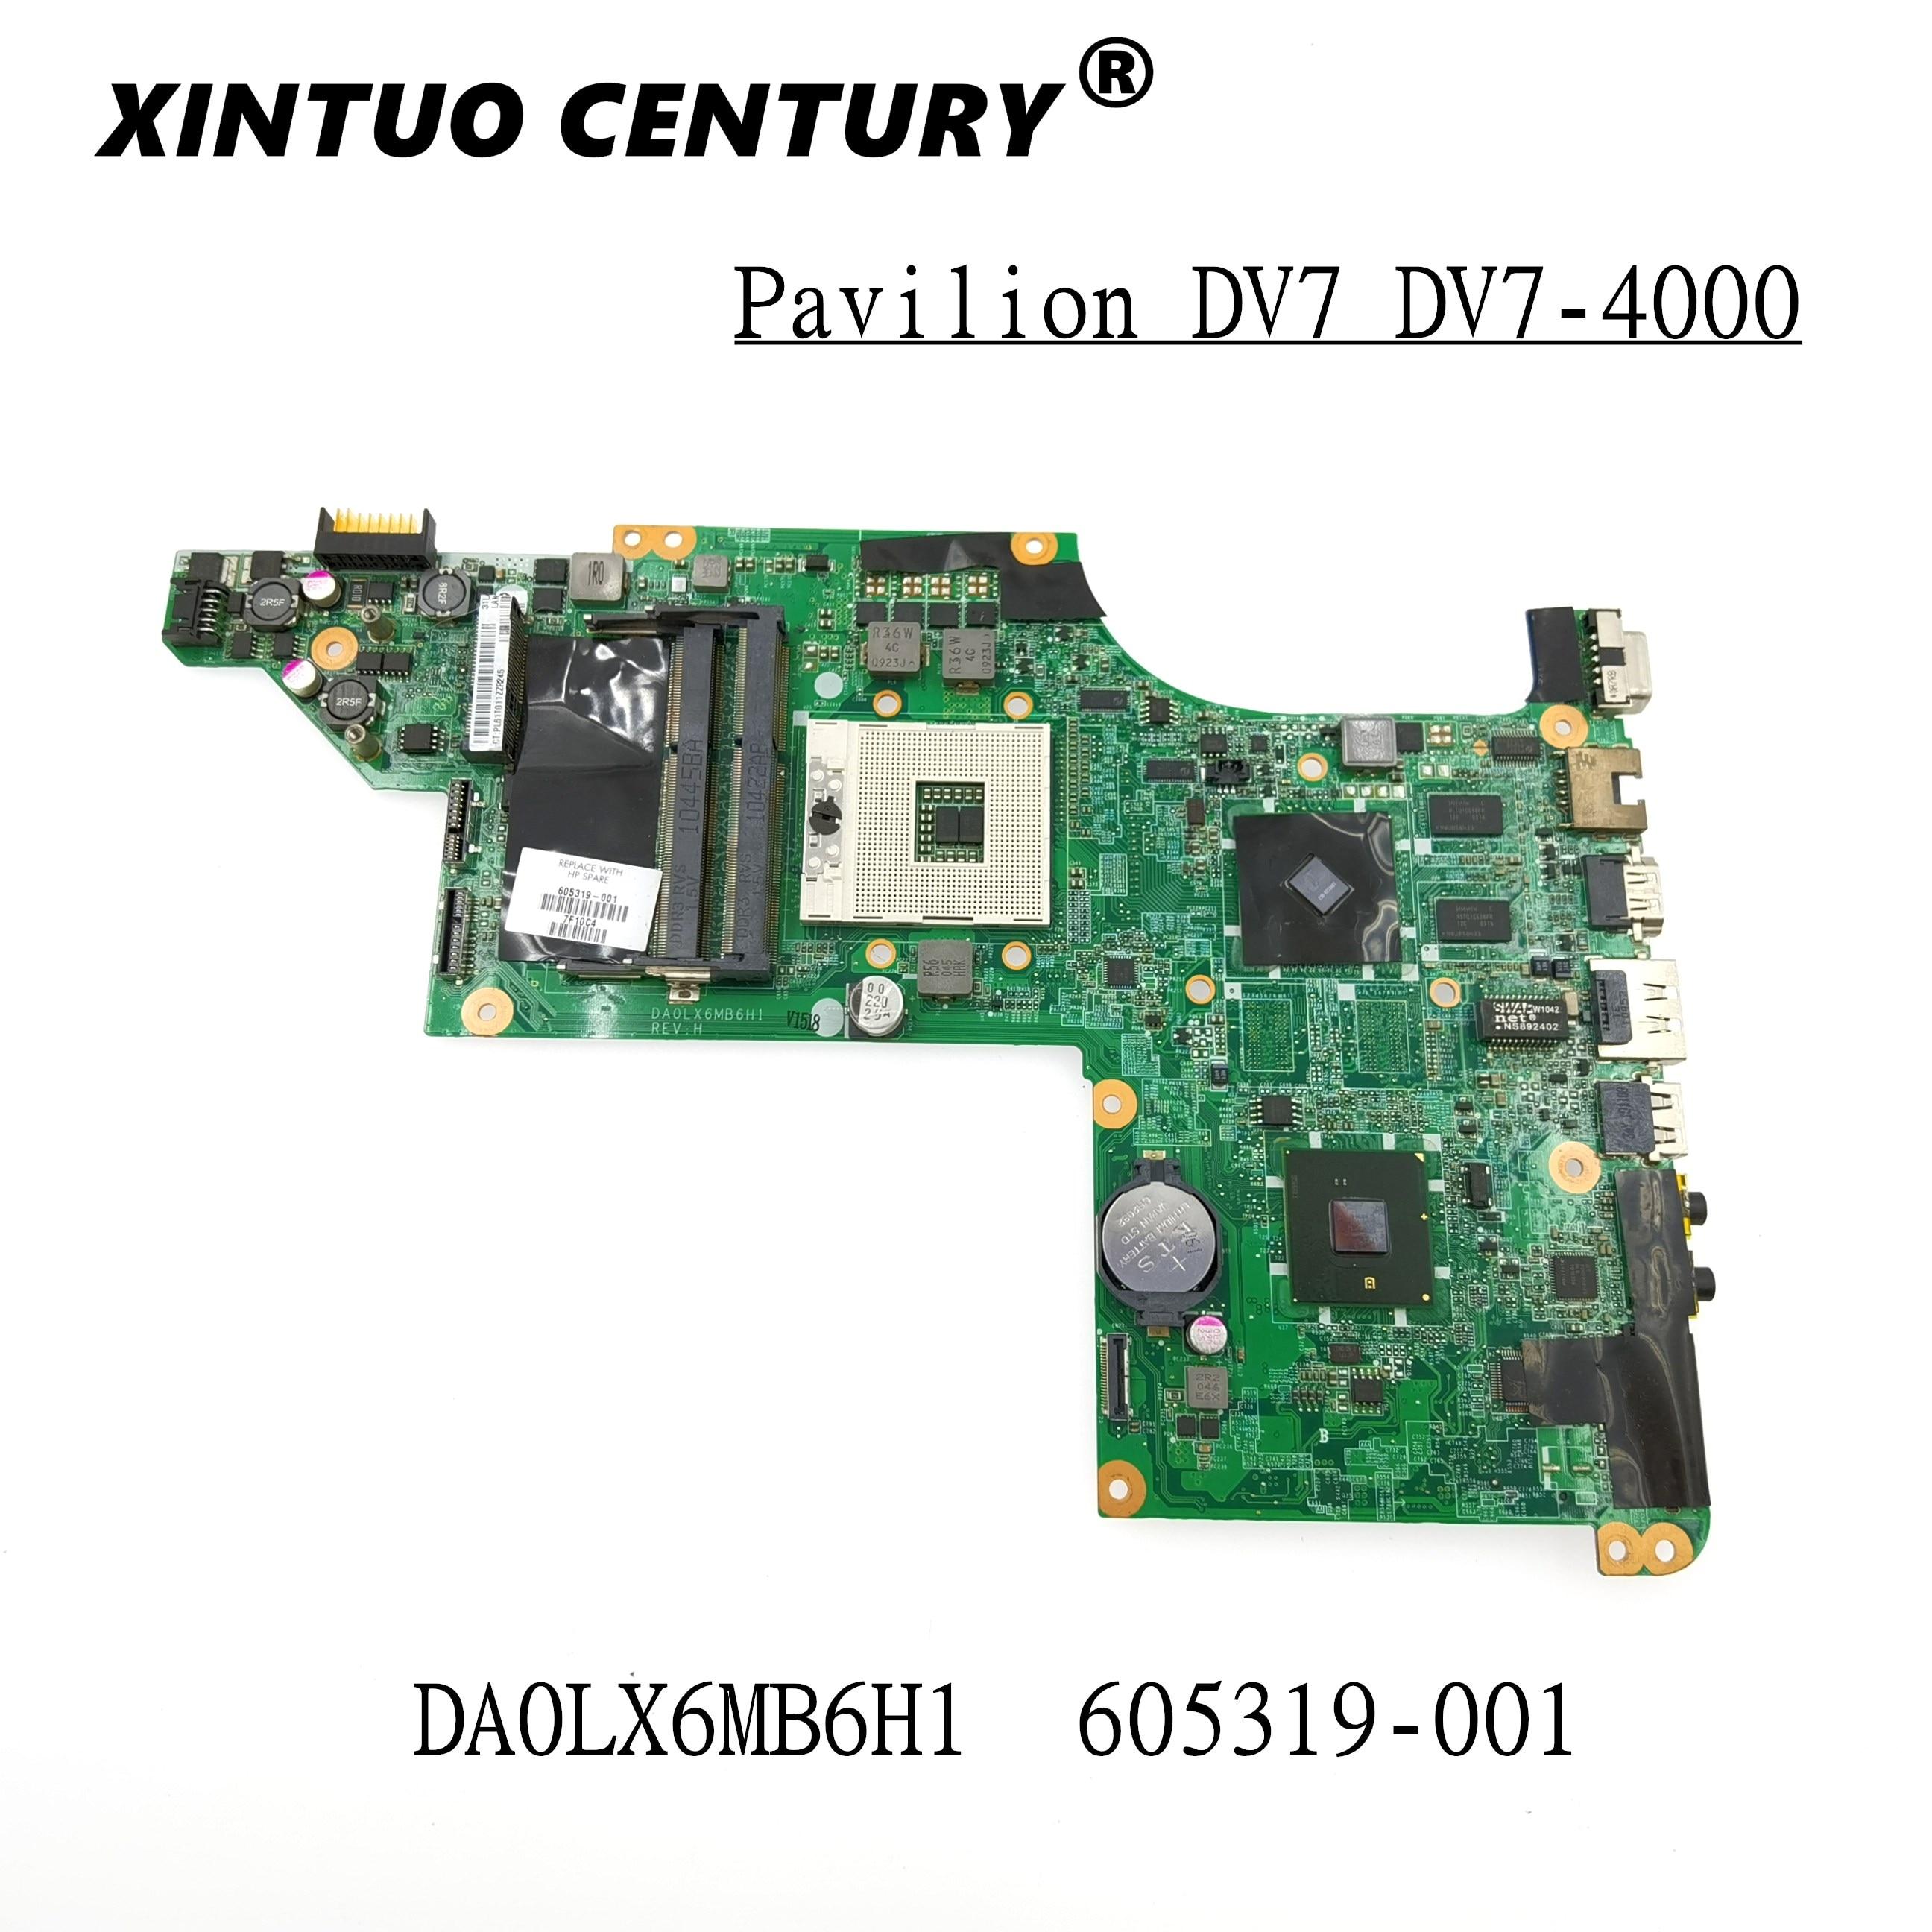 605319-001 Tablero Principal para HP Pavilion DV7 DV7-4000 placa base de ordenador...